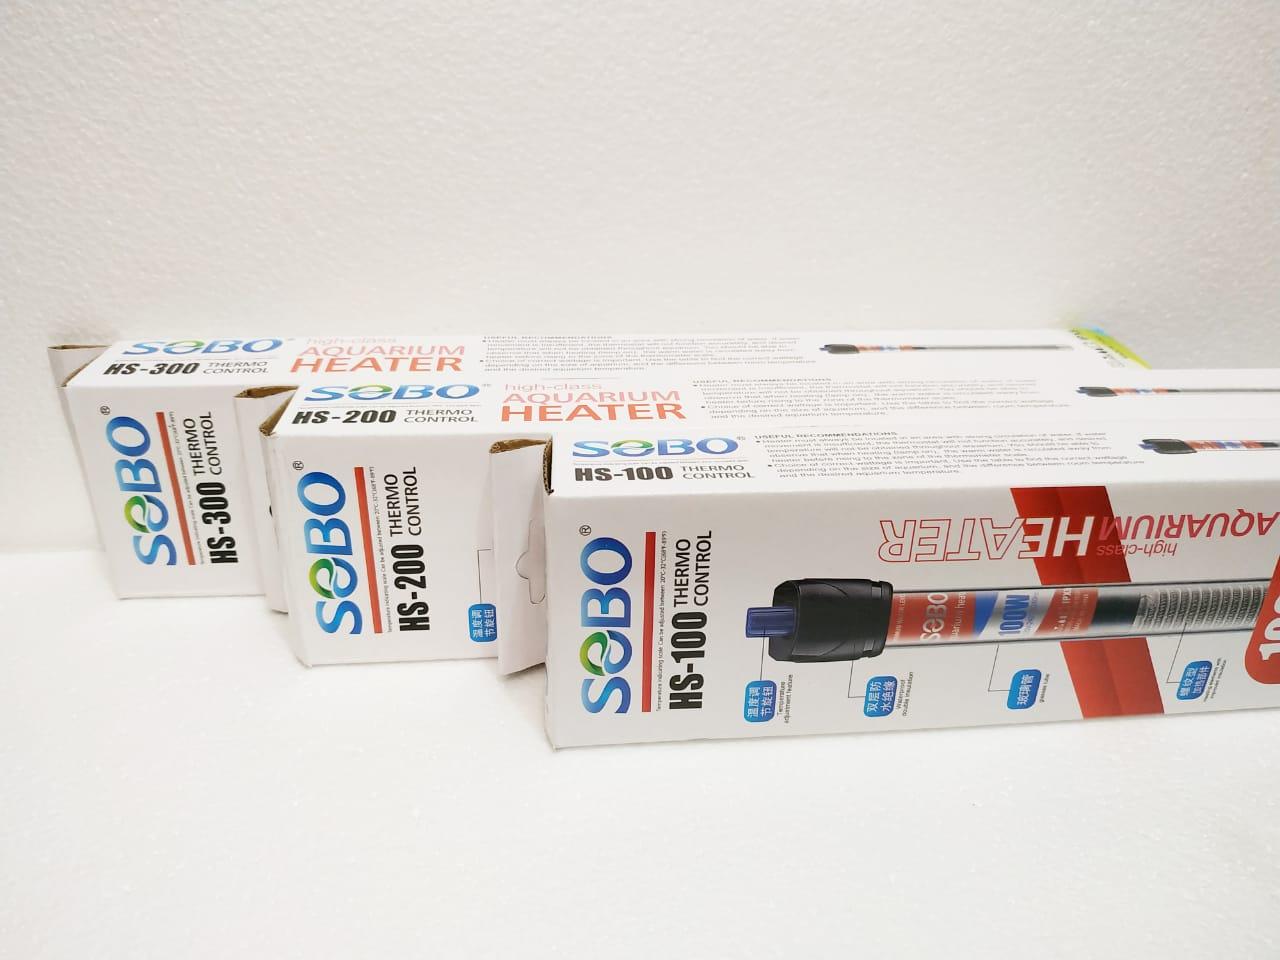 Termostato SOBO HS  - FISHPET Comércio de Acessórios para Animais Ltda.